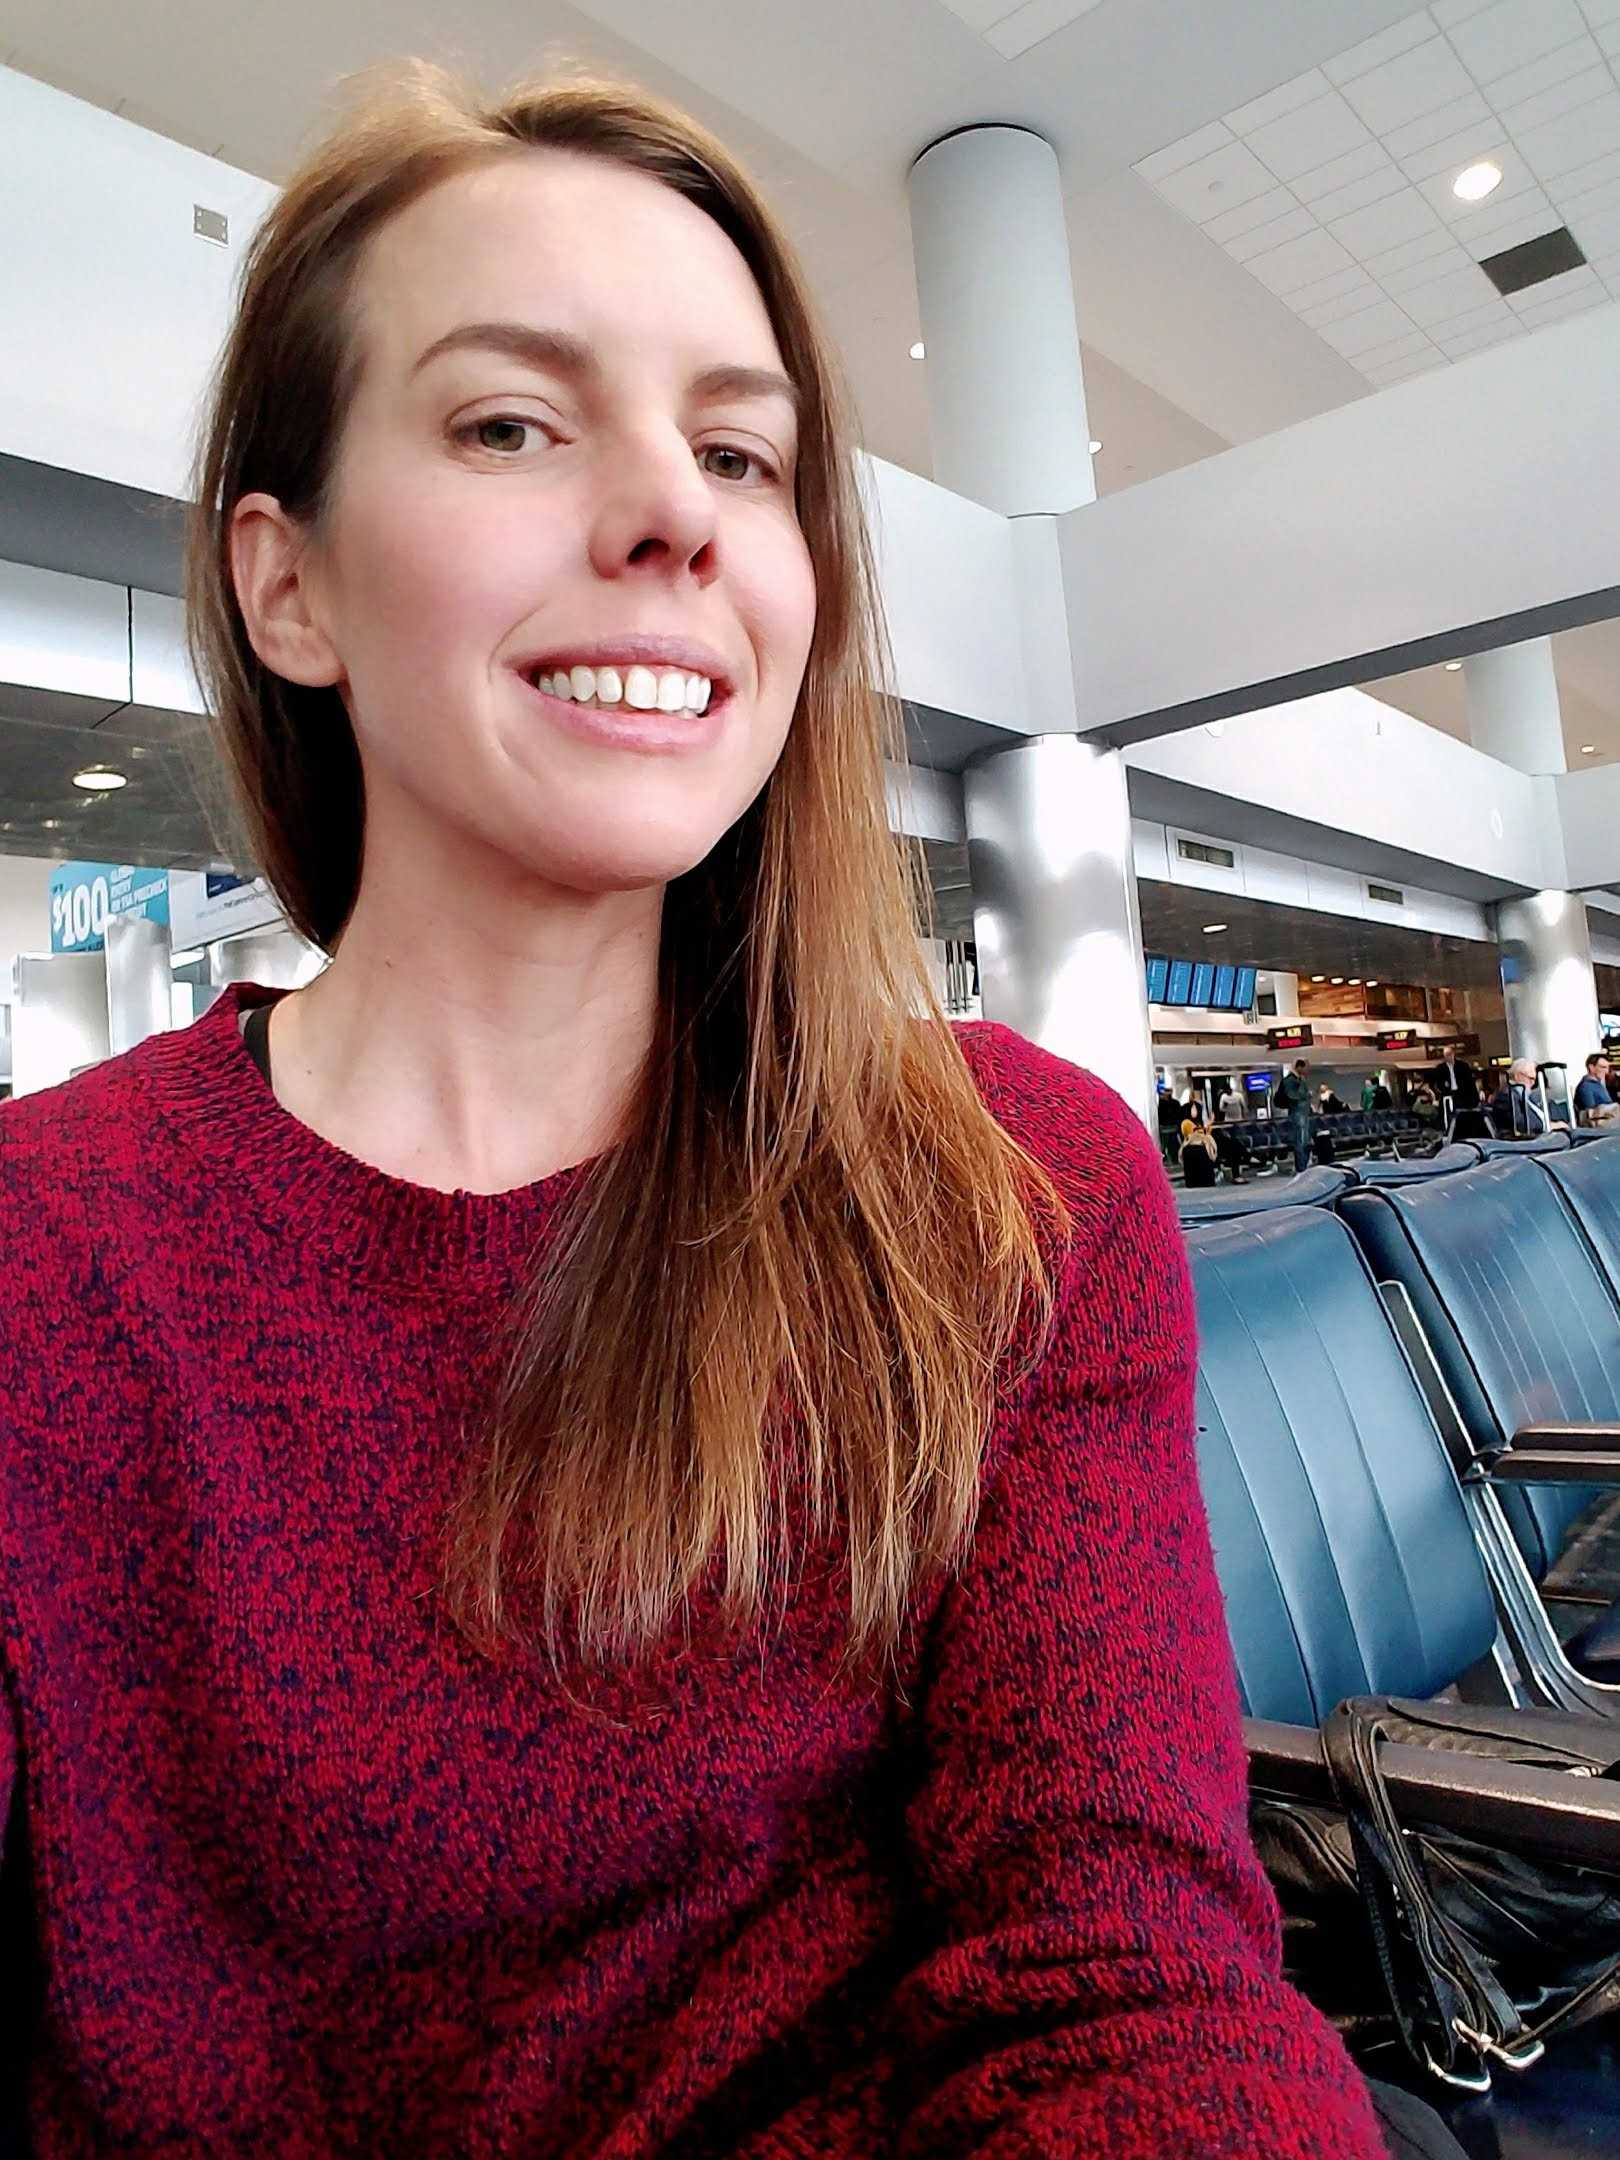 Golden Software Customer Support Guru Justine Carstairs